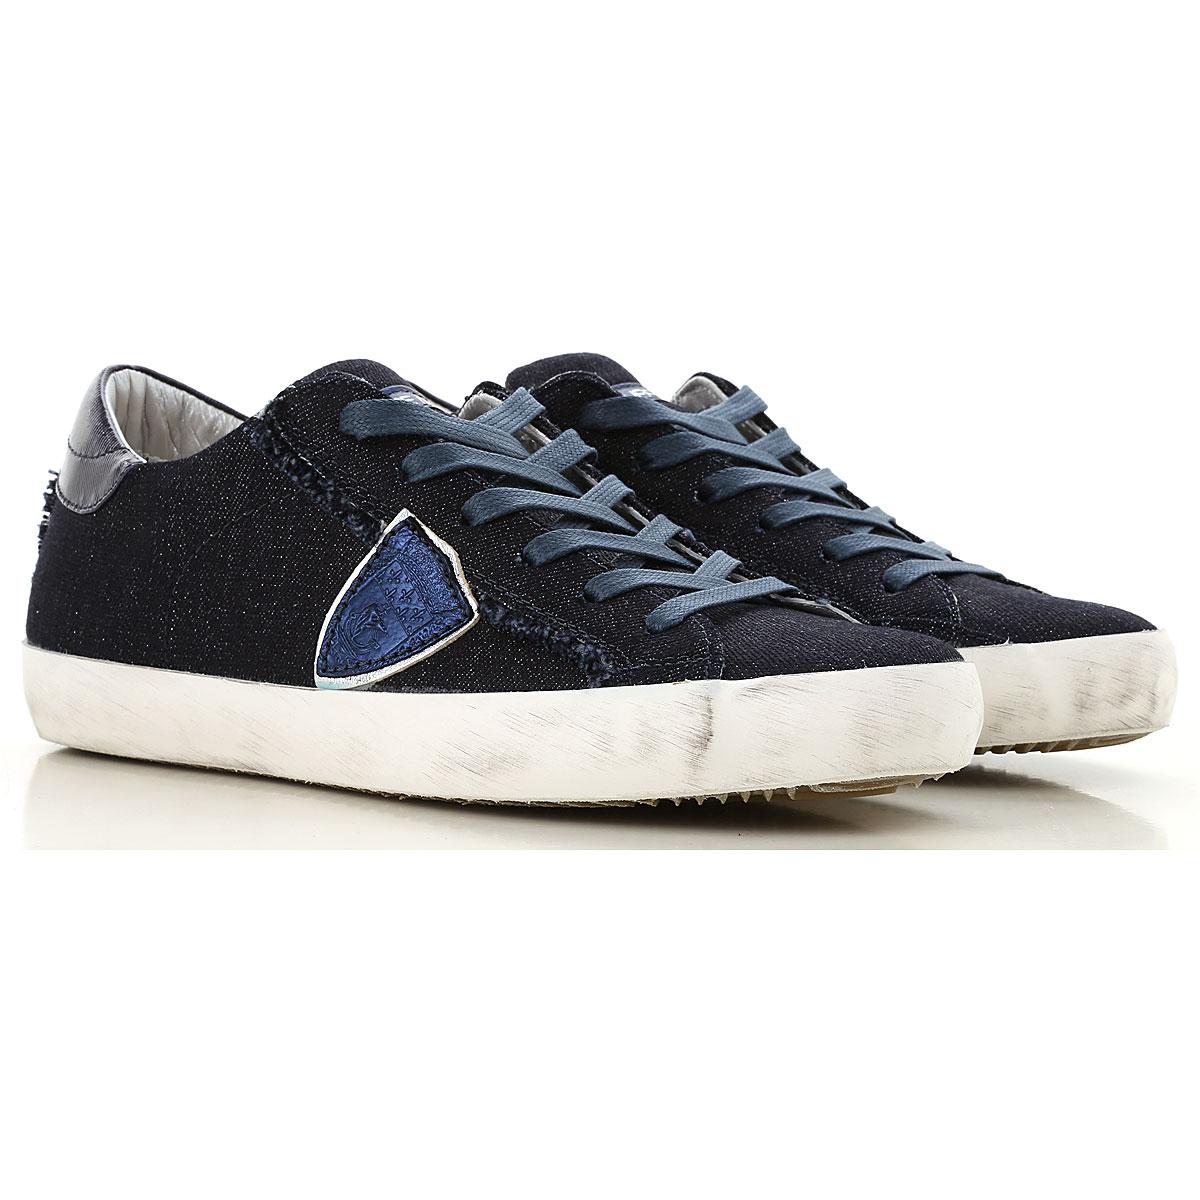 Philippe Model Sneakers for Women On Sale, Blue Denim, Denim, 2019, 3.5 4.5 6.5 7.5